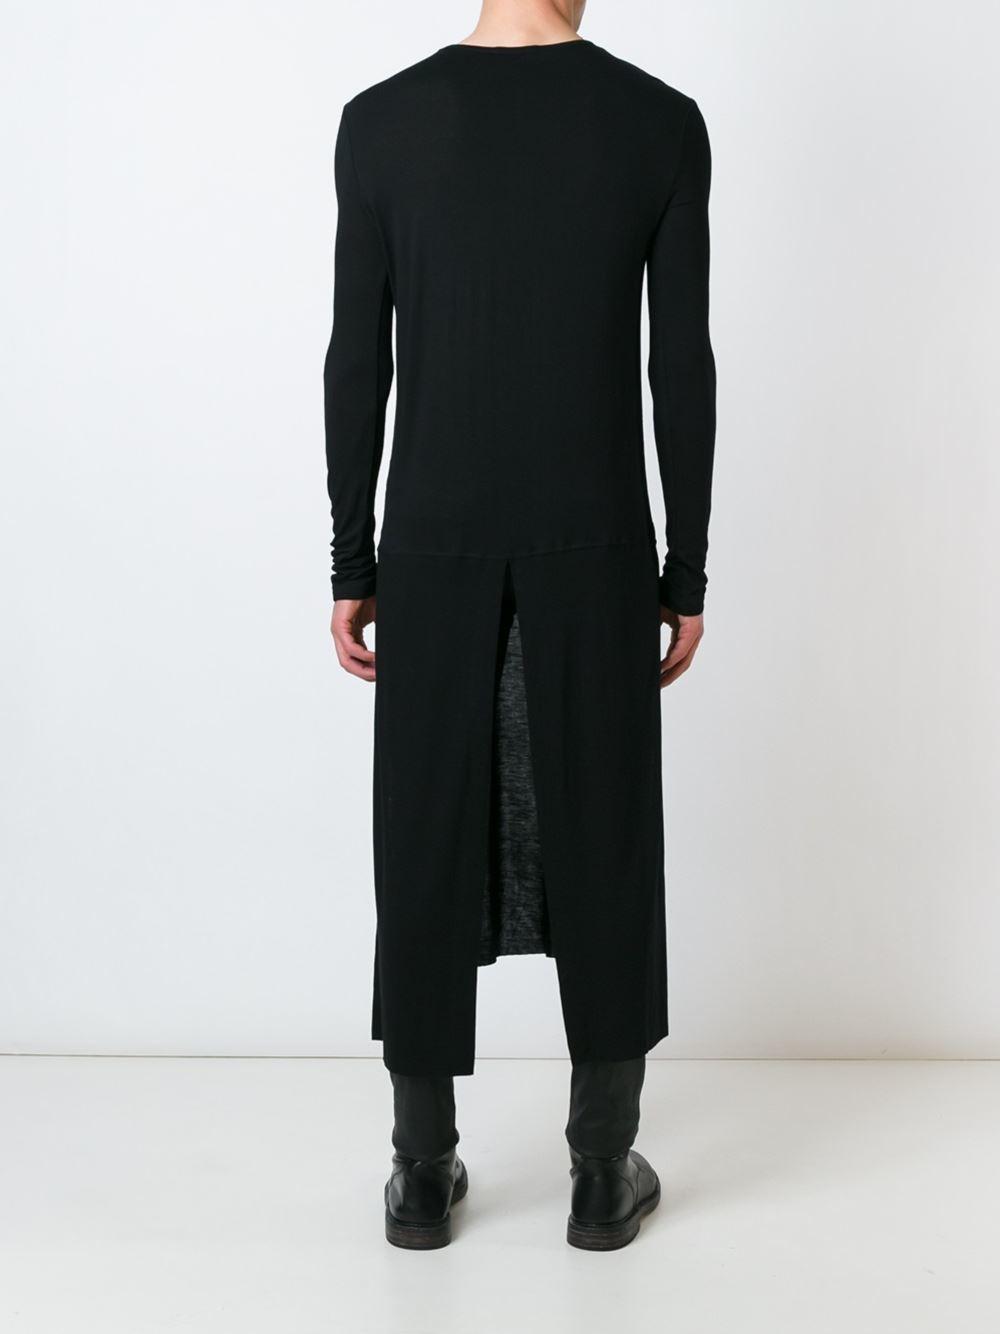 Unconditional rear split tail t shirt in black for men lyst for Bradley wiggins tattoo sleeve